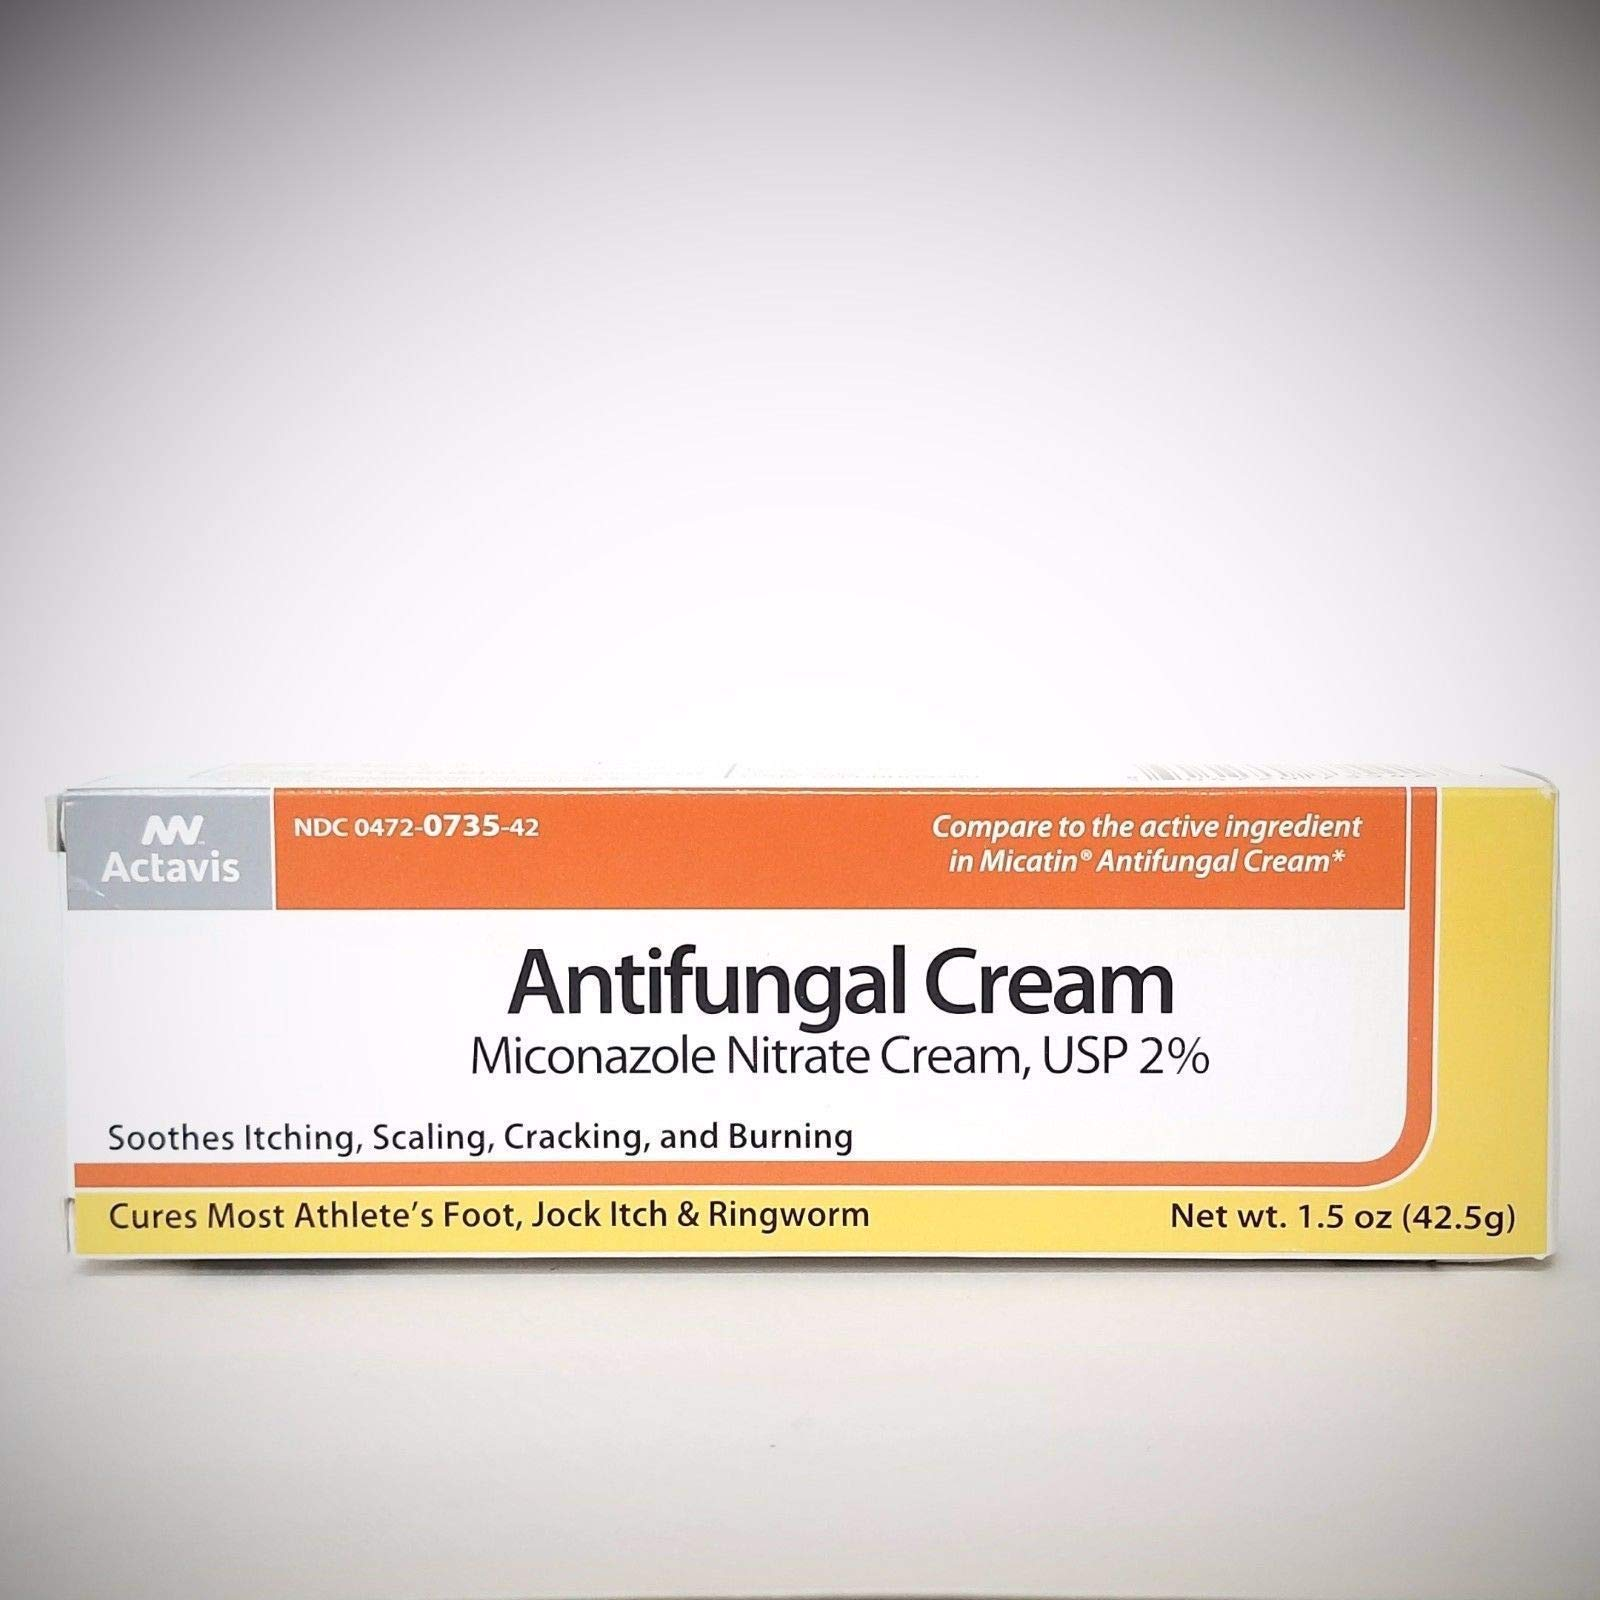 Actavis Miconazole Nitrate 2% Antifungal Cream - 1.5 oz, Pack of 5 by Actavis